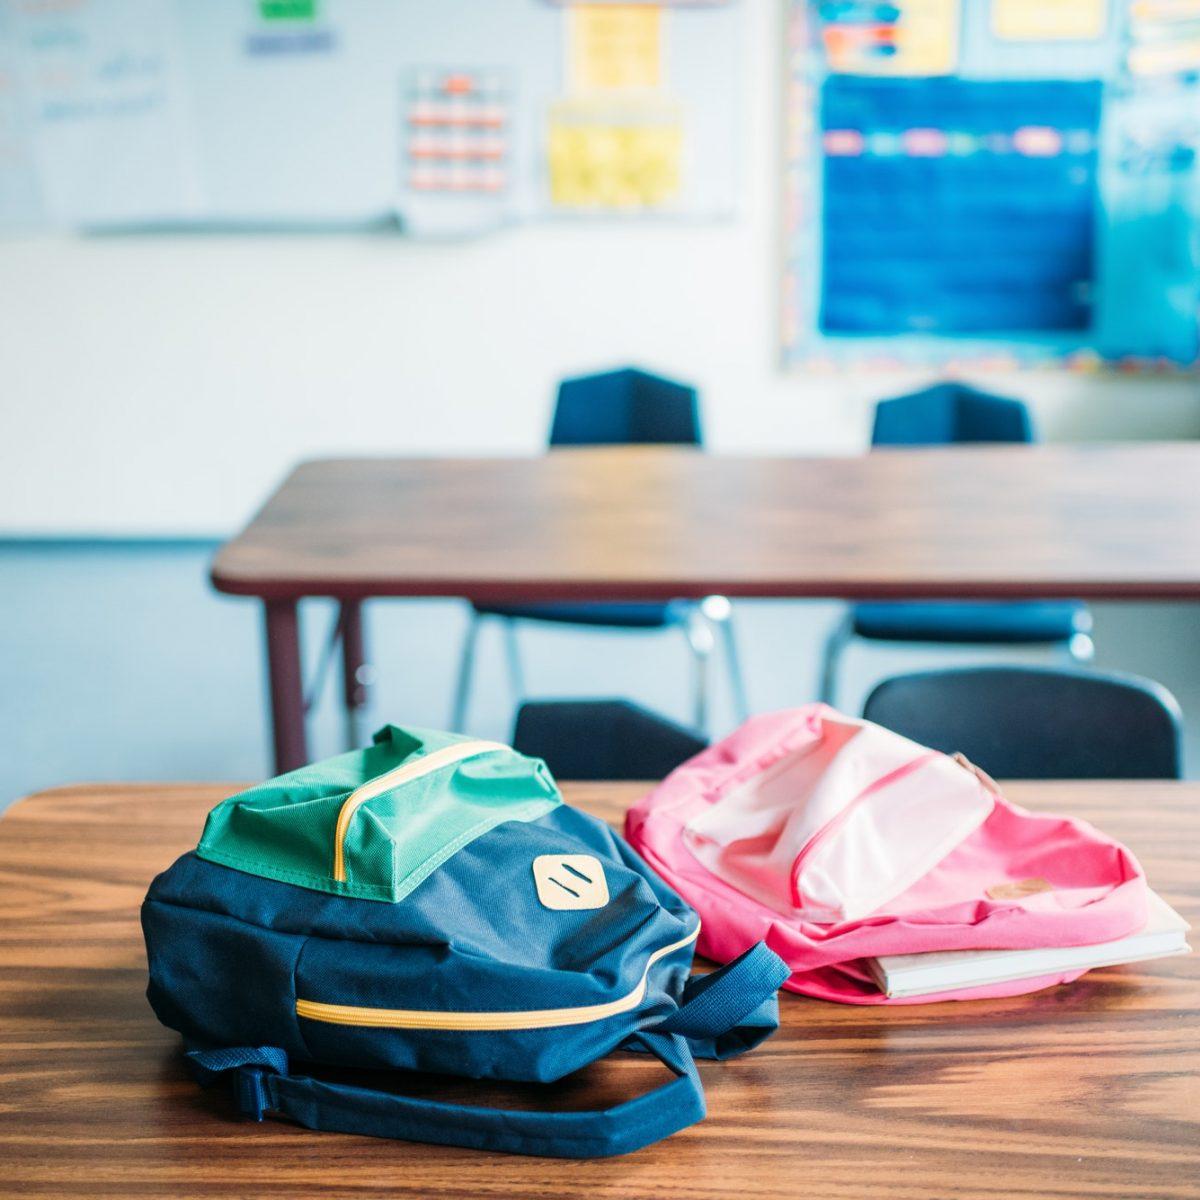 تجهيزات مدارس